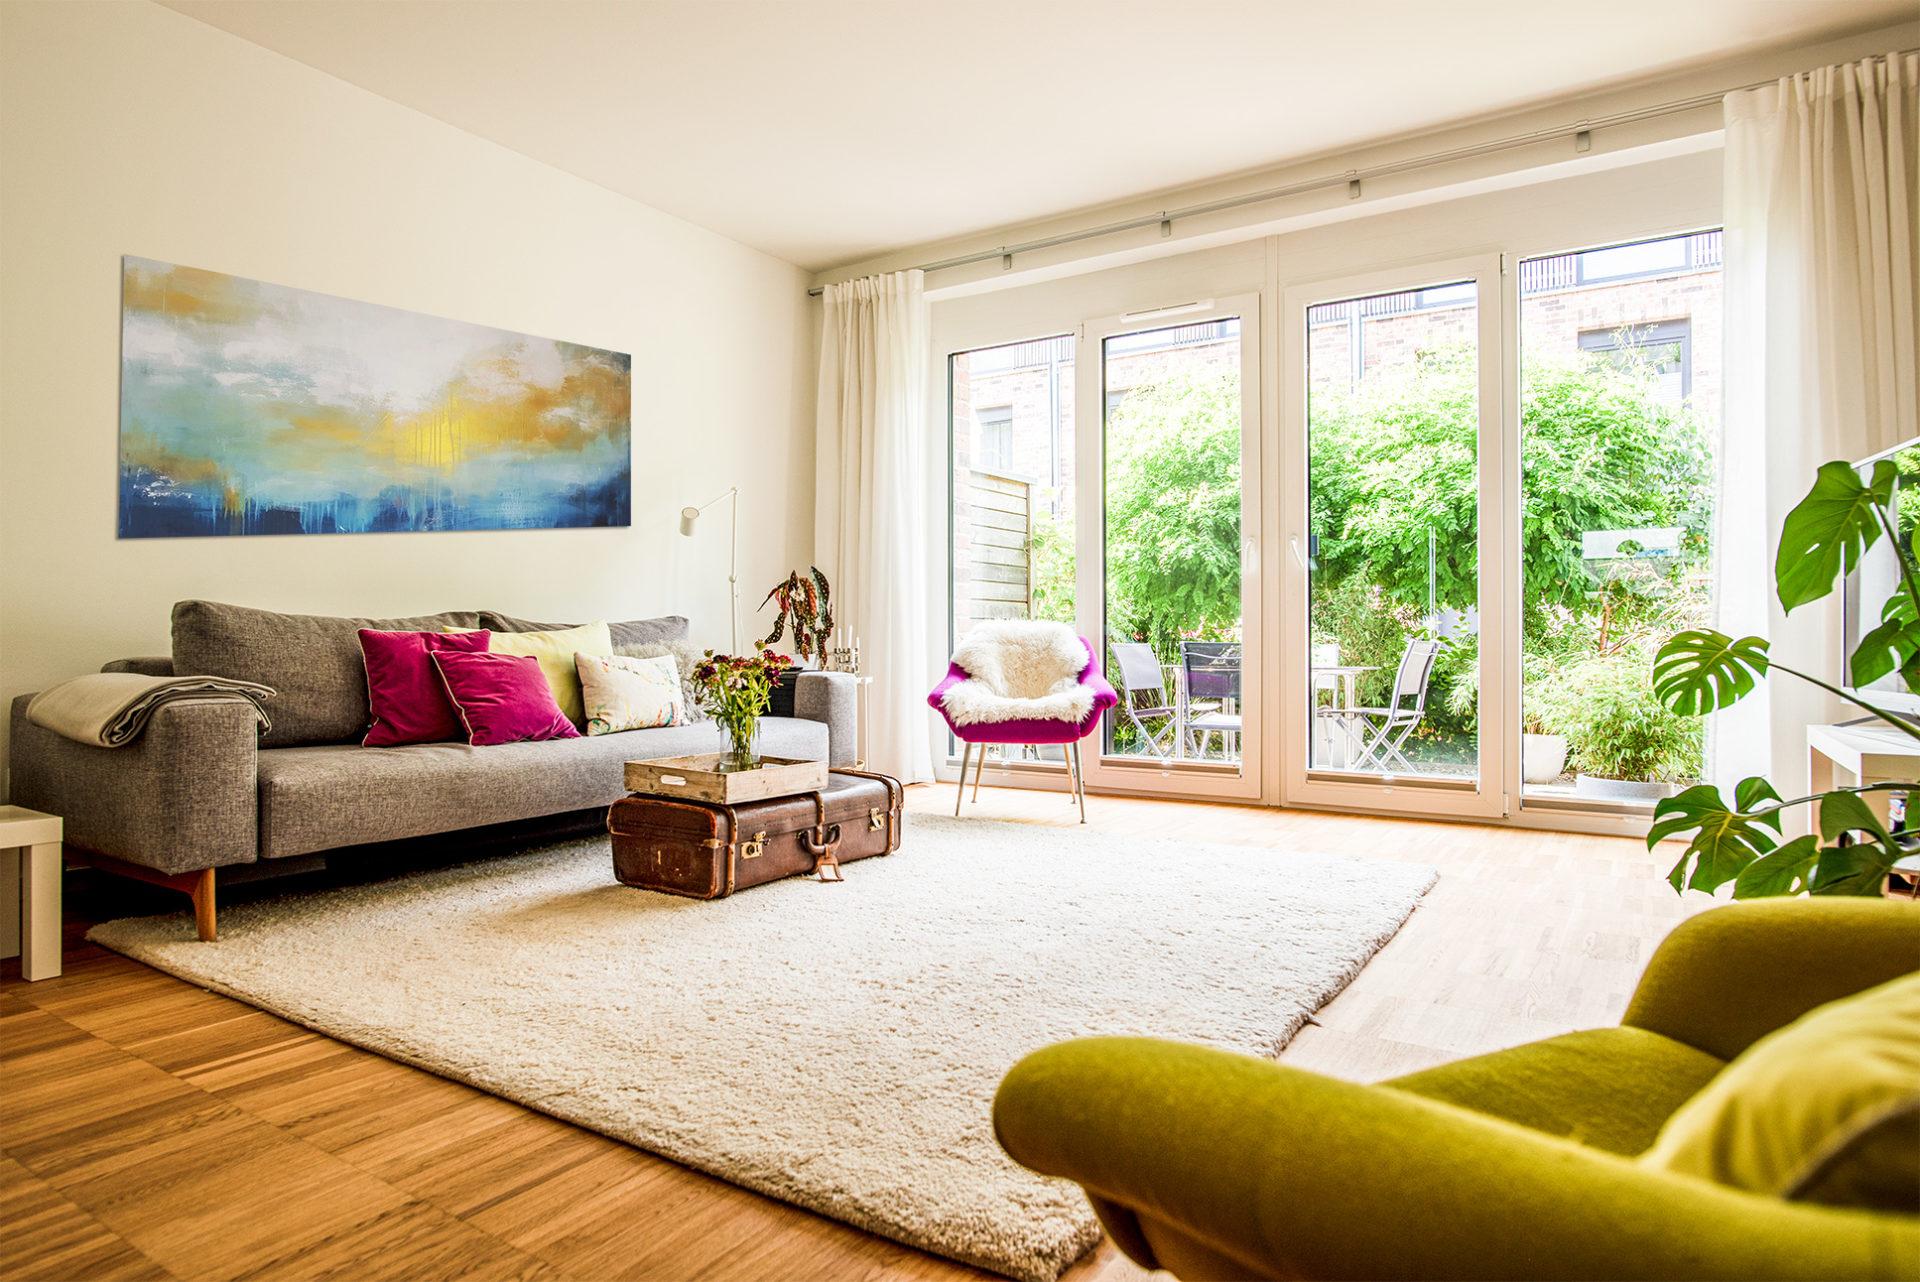 Immobilienfoto Haus Friedrichsort Kiel